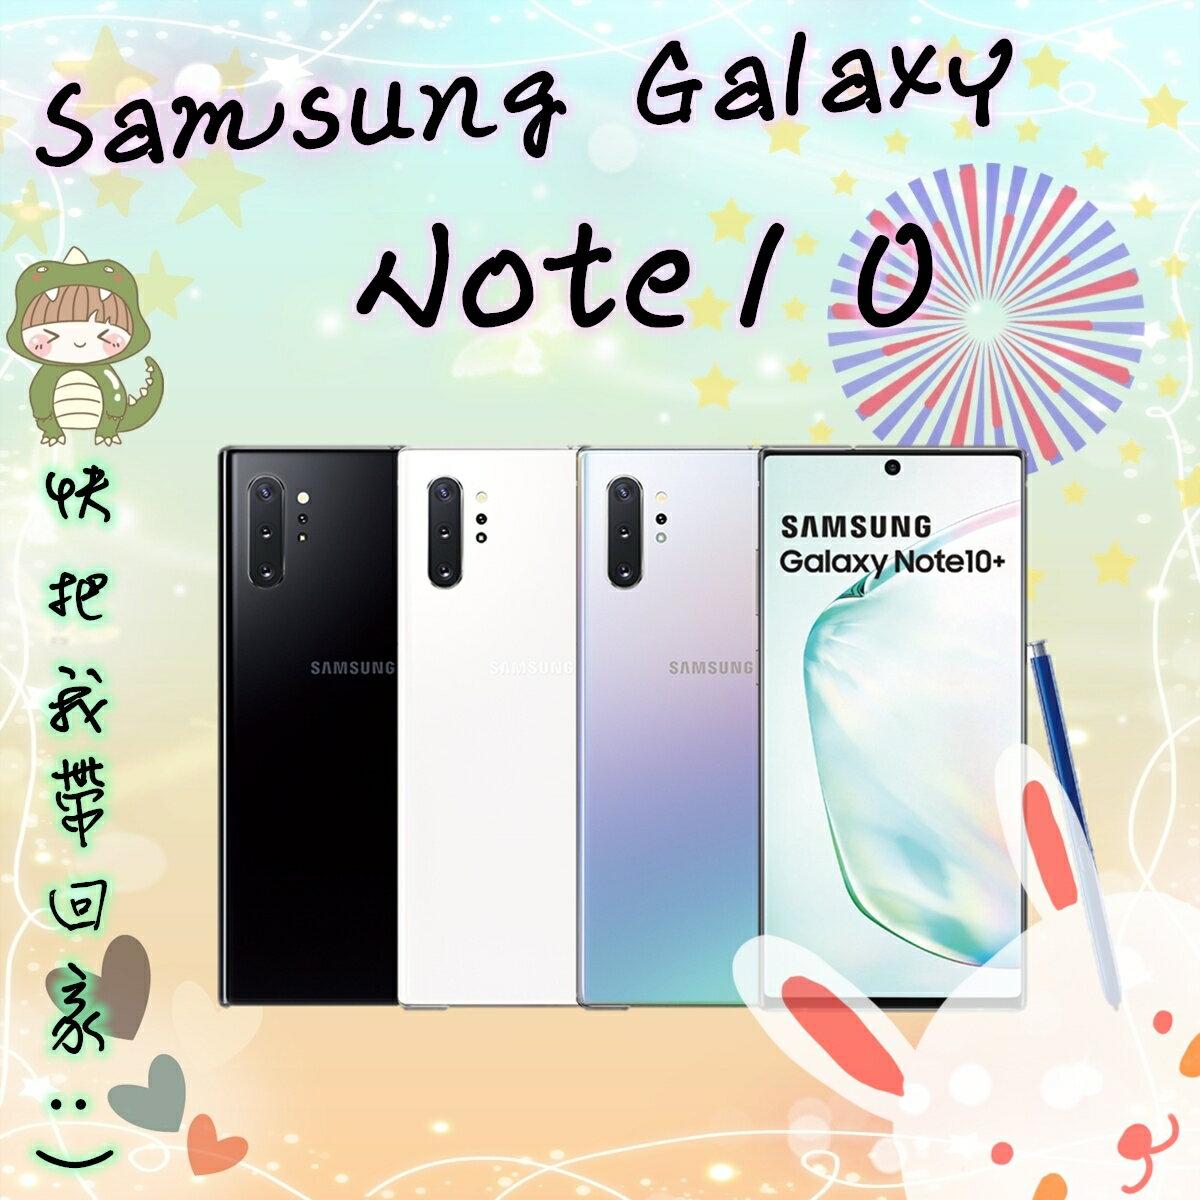 Note 10 8G / 256G 6.3吋 Samsung 三星 隔天到貨 全新未拆公司貨 原廠保固一年 0